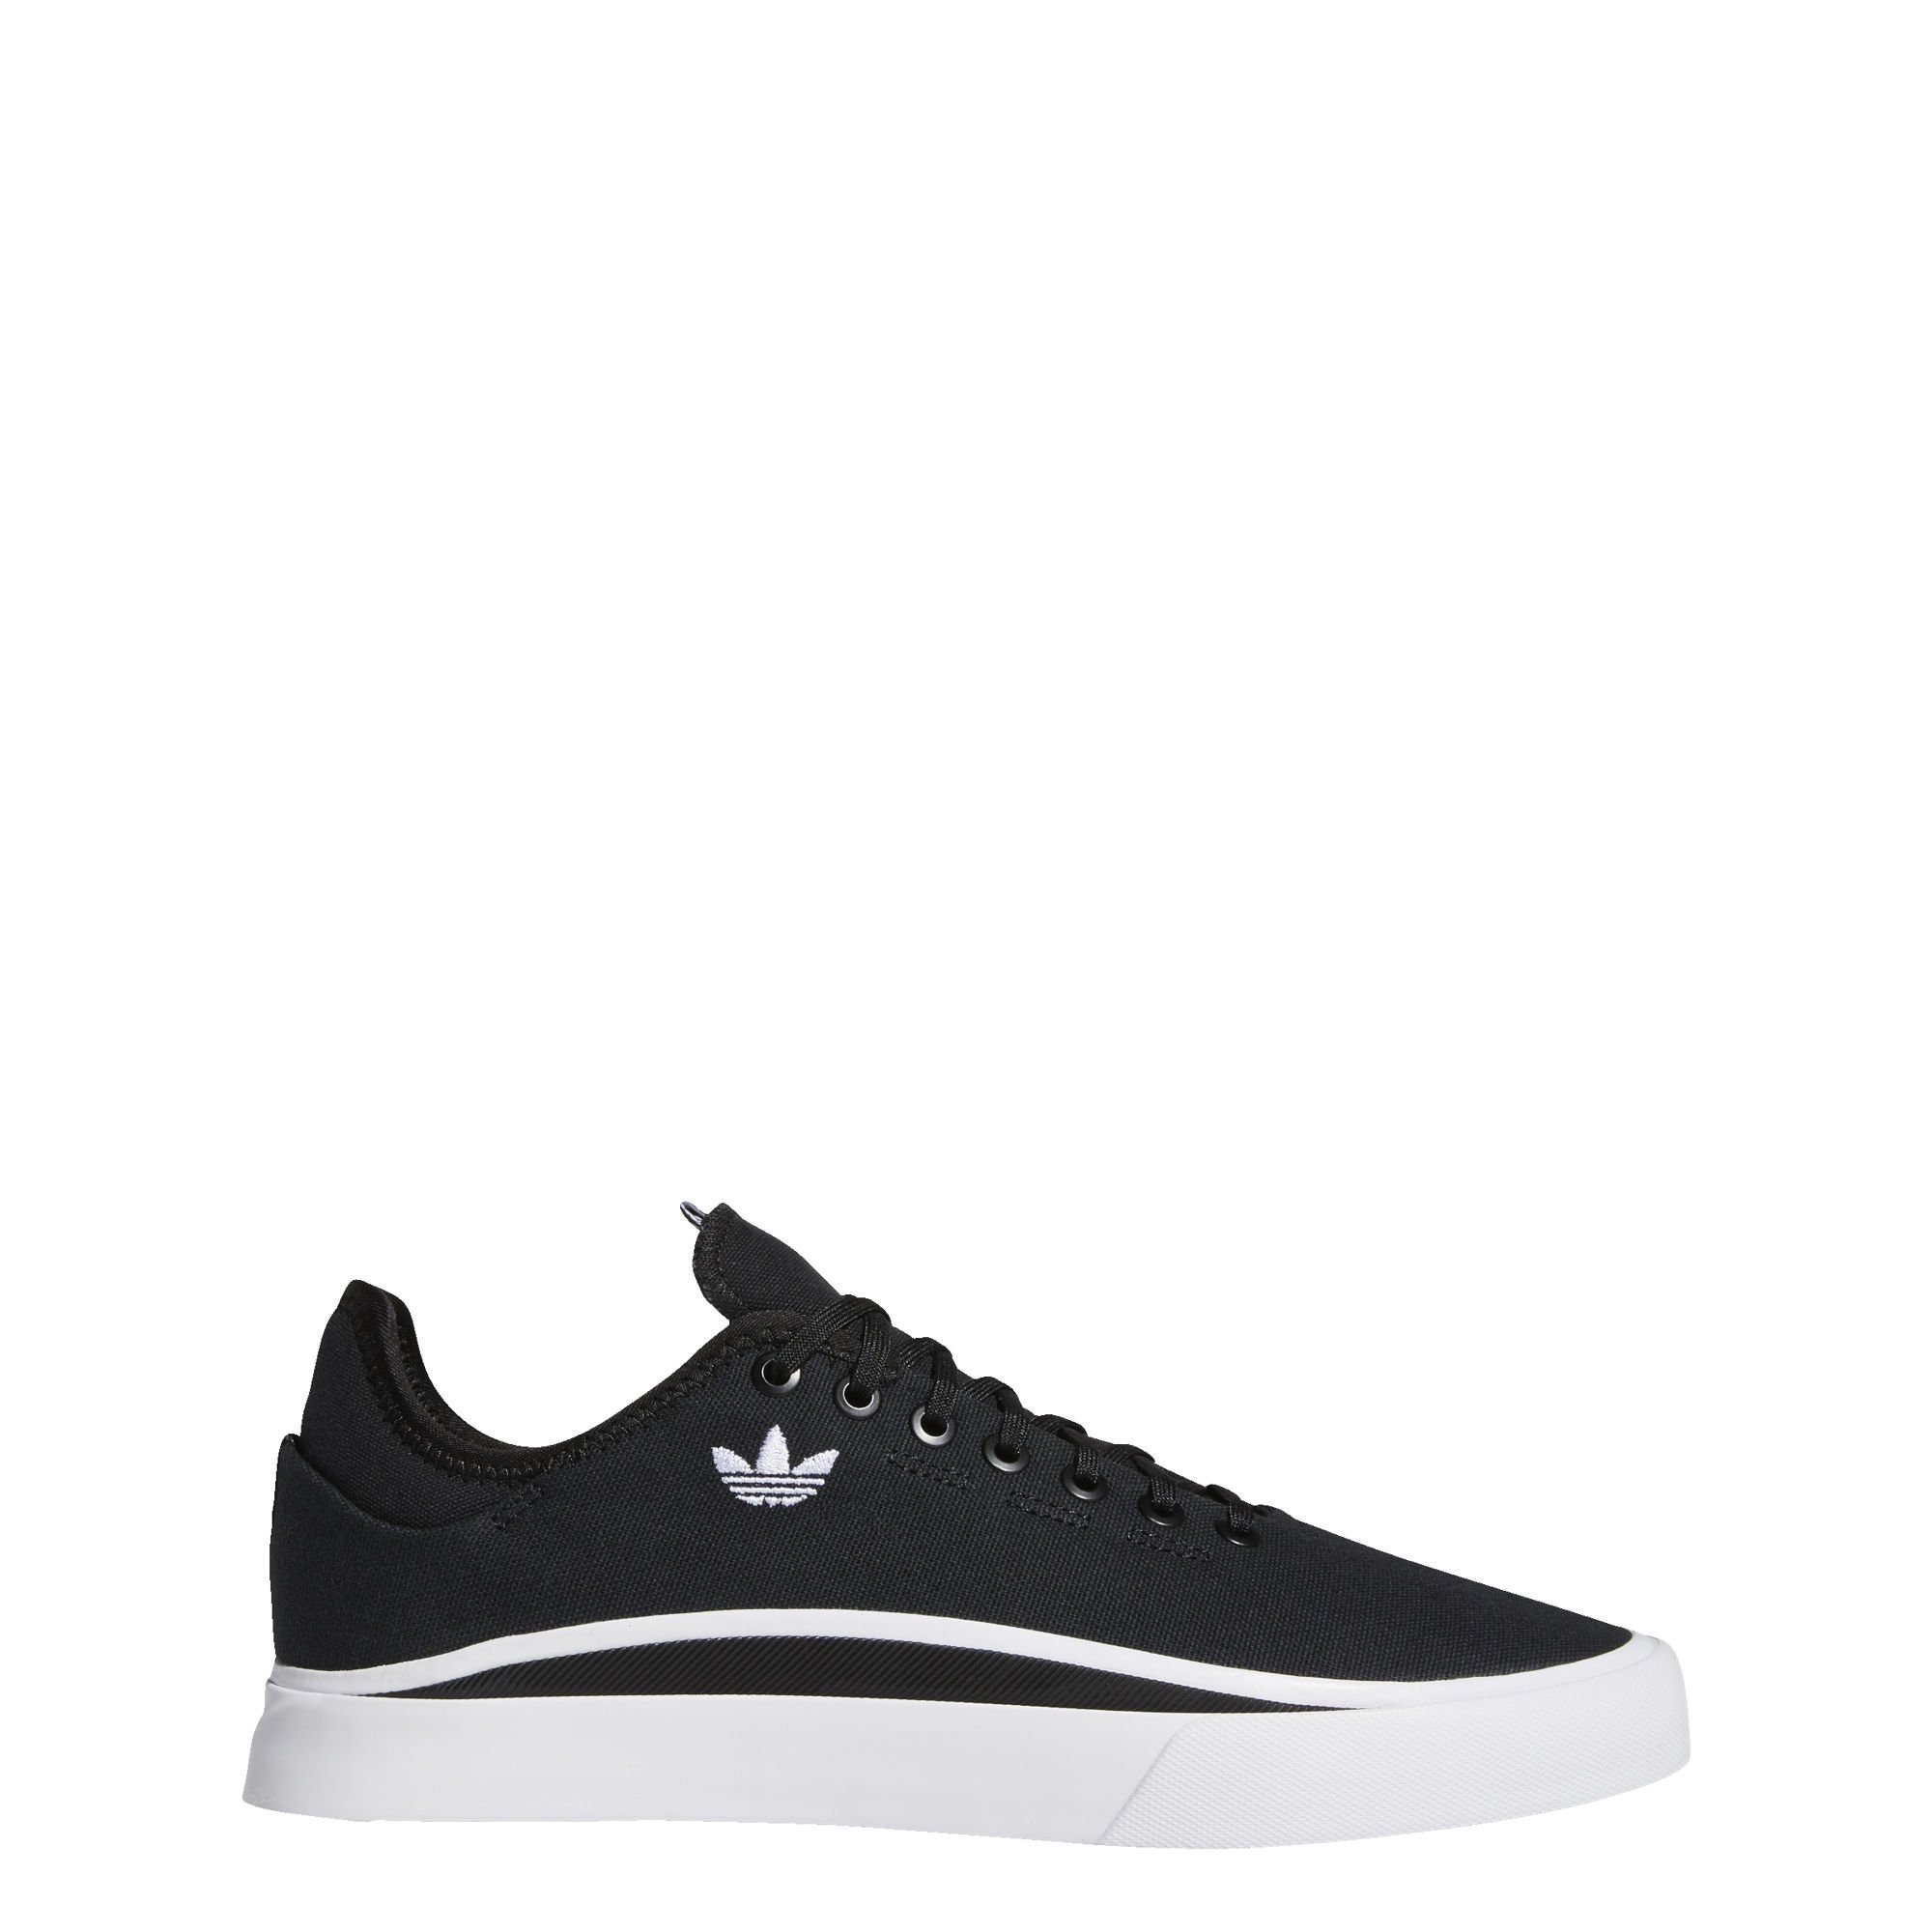 Sneaker Schuh« KaufenOtto »sabalo Adidas Originals 7Yf6ygb